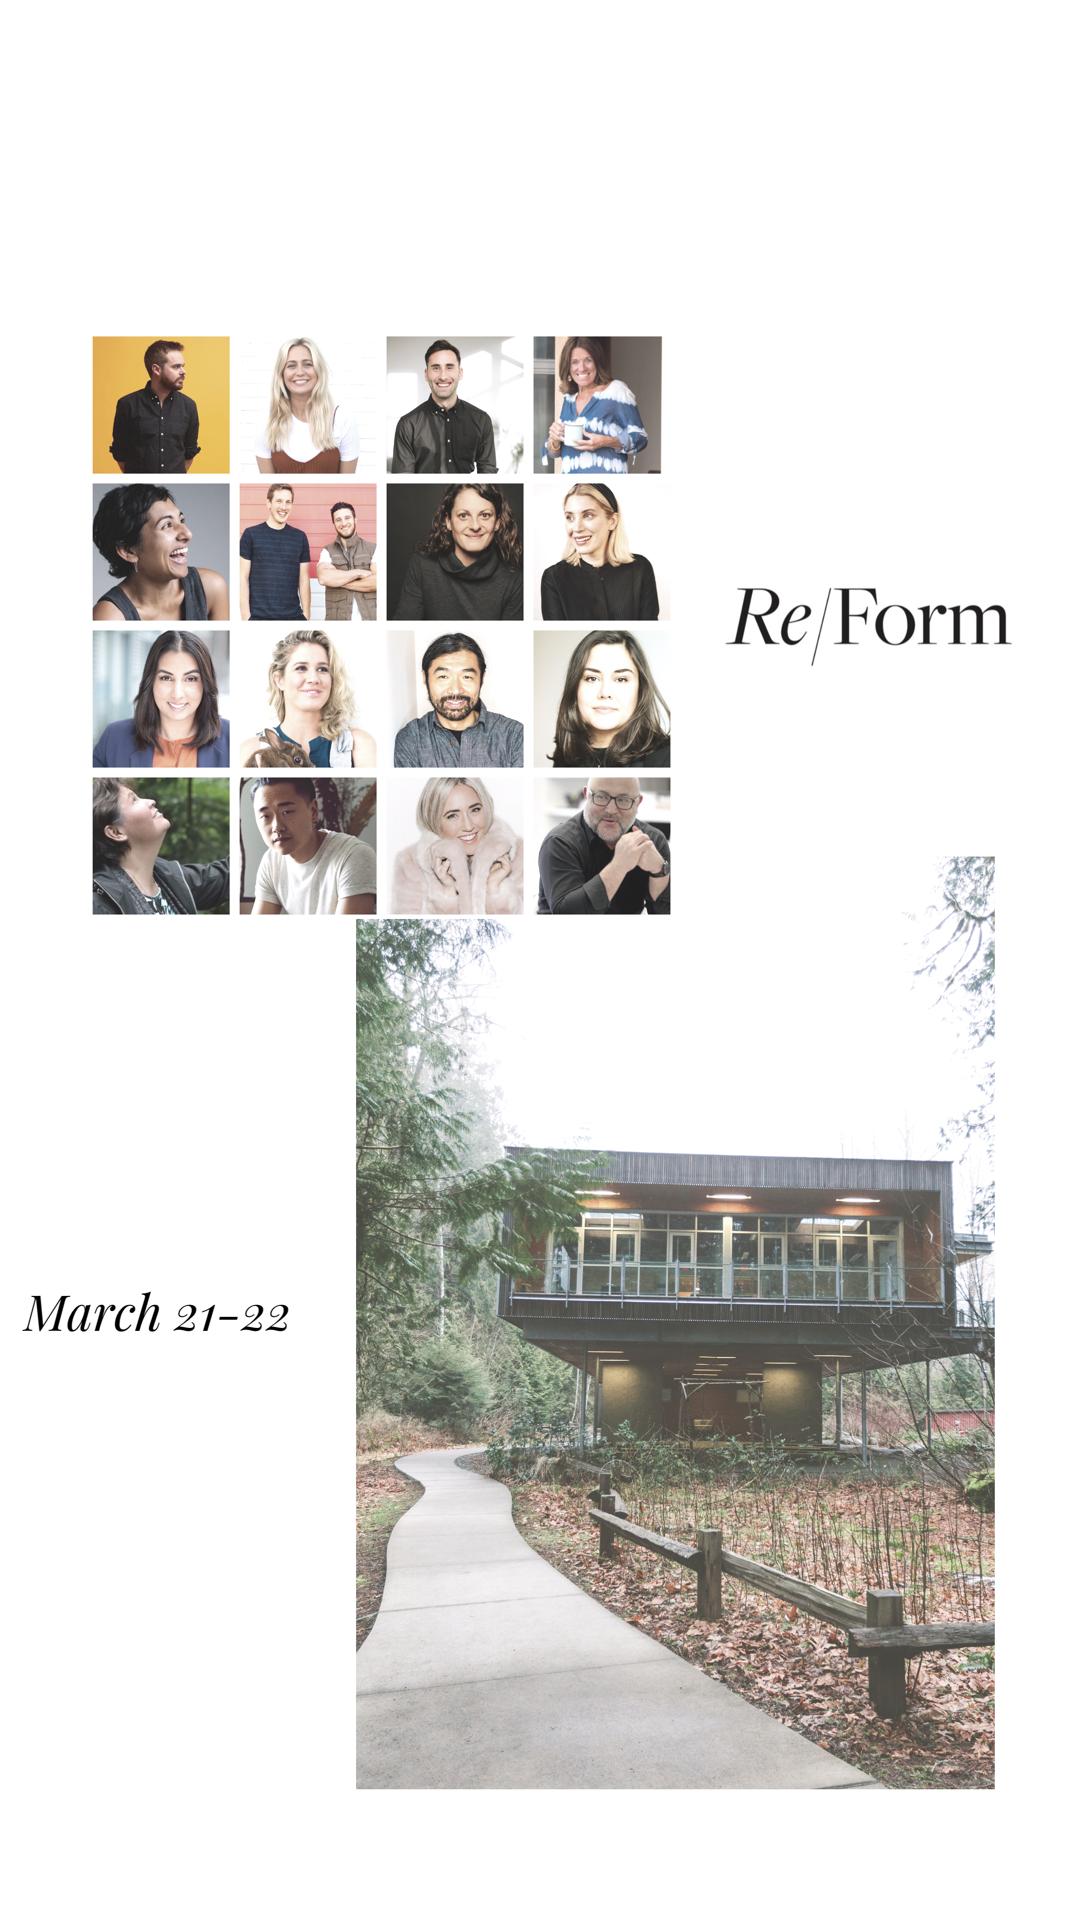 reform conference chantel chapman